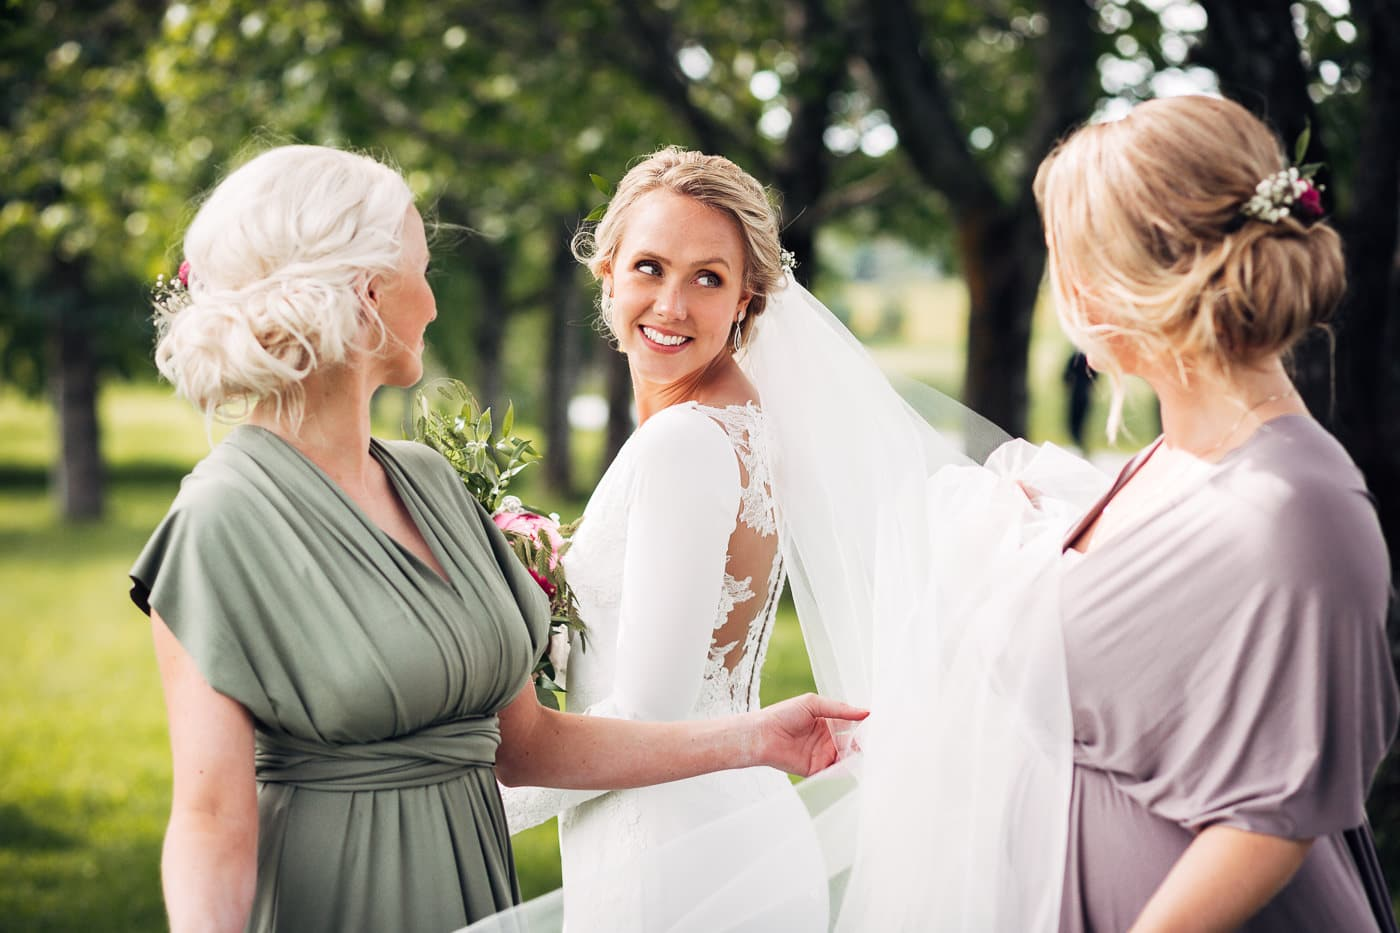 Karoline & Andreas - bryllup i Østfold med magiske detaljer Bryllup Fredrikstad Fotograf 50